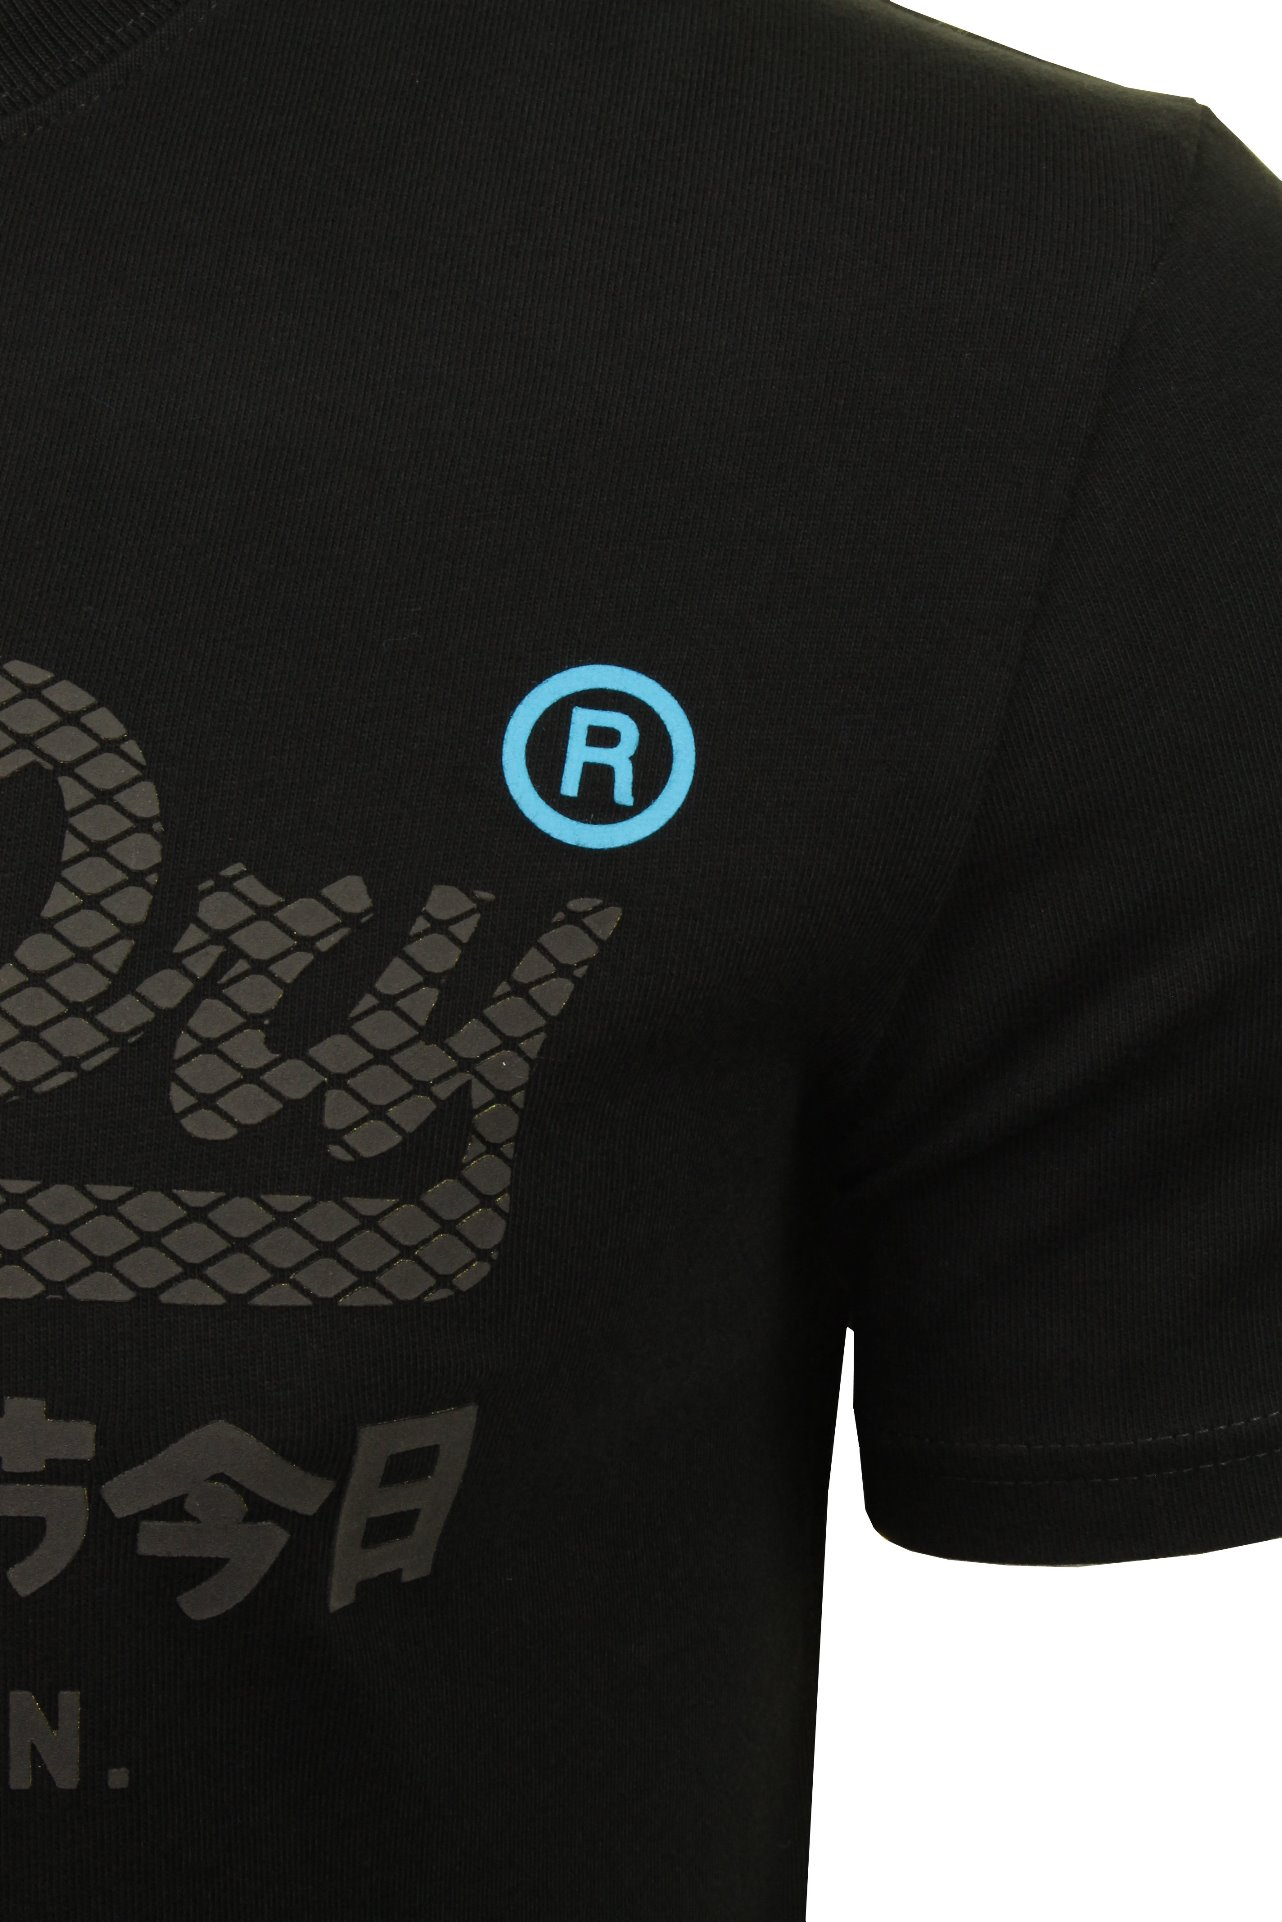 Superdry-039-Monochrome-039-Mens-T-Shirt thumbnail 4